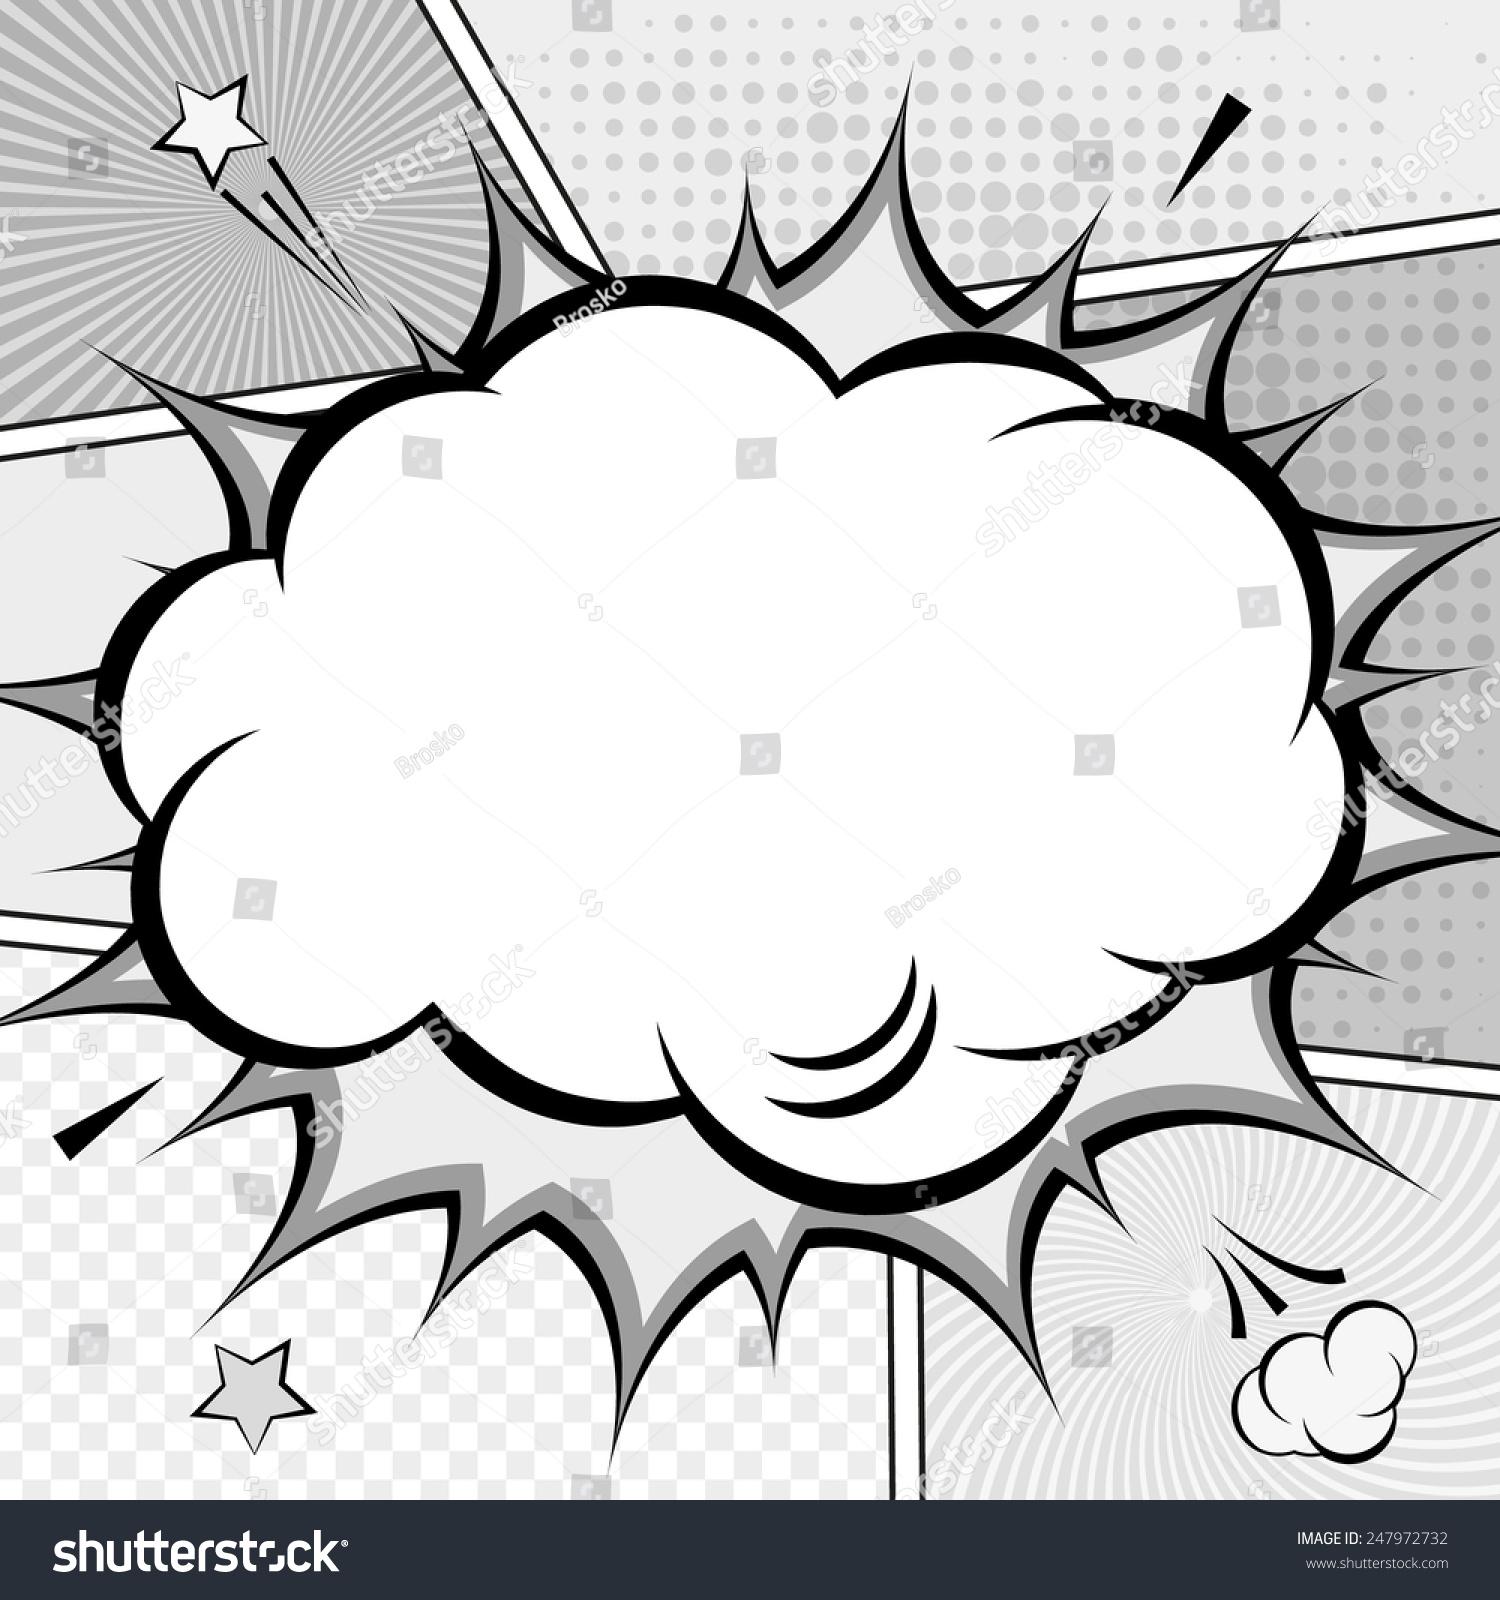 Comic Speech Bubble Background Popart Style Stock Vector 247972732 ...